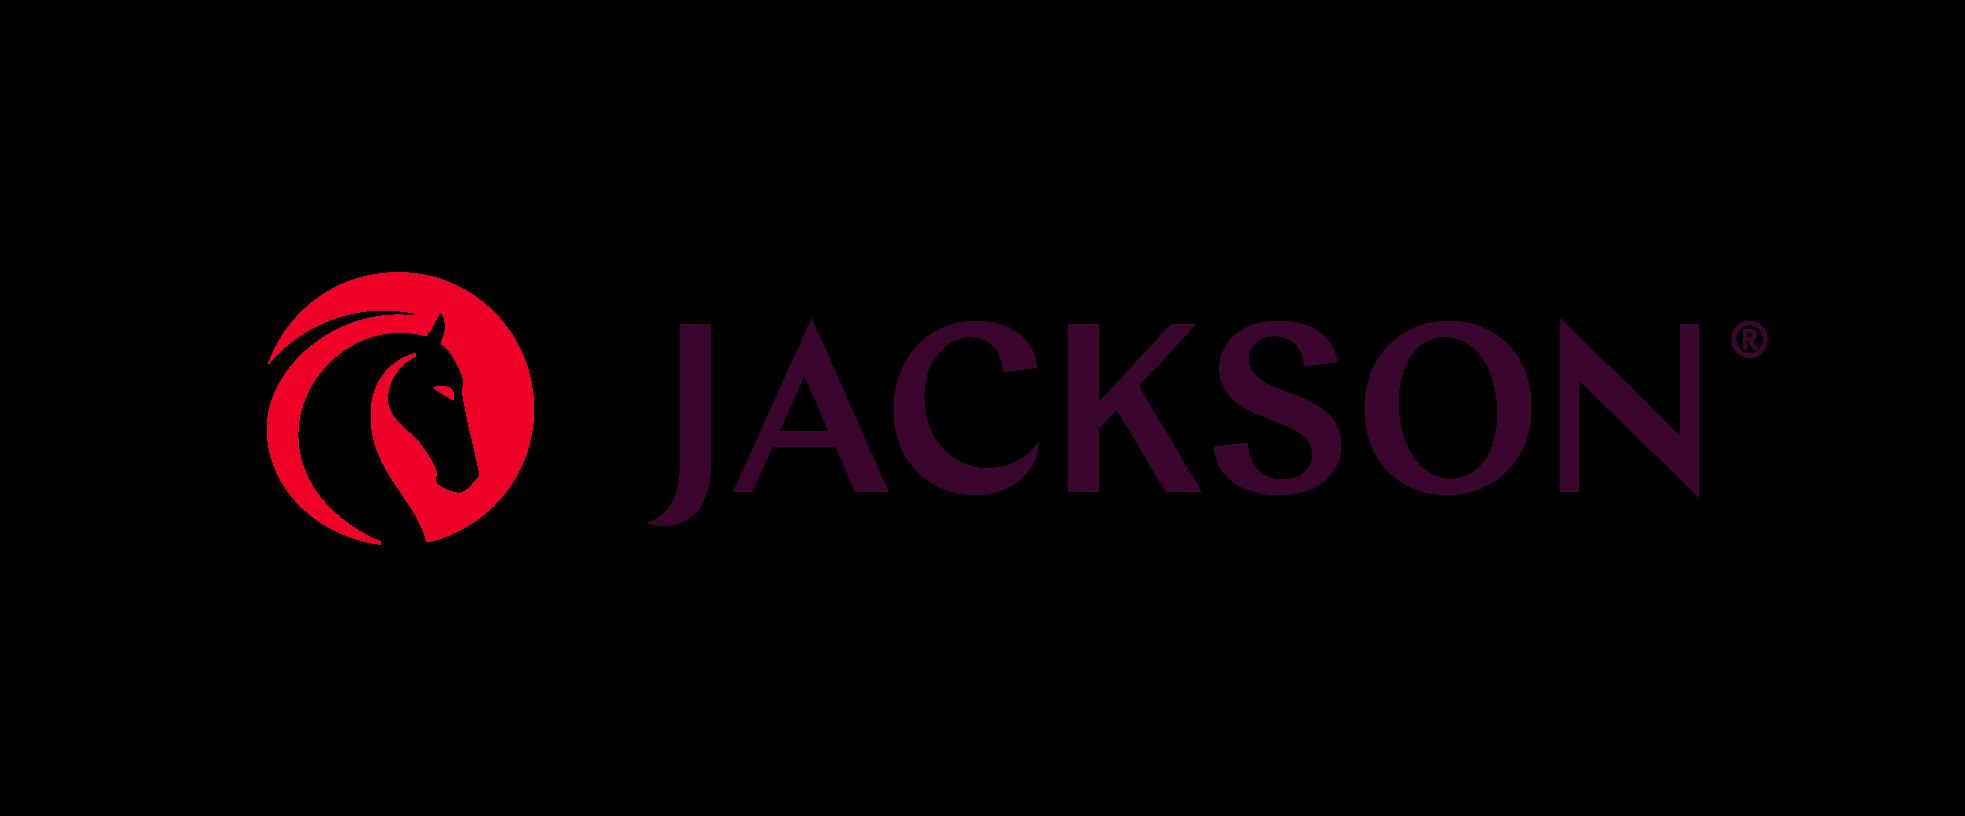 https://growthzonesitesprod.azureedge.net/wp-content/uploads/sites/1087/2021/08/Jackson_logo_reg_col_pos_rgb_2021.png